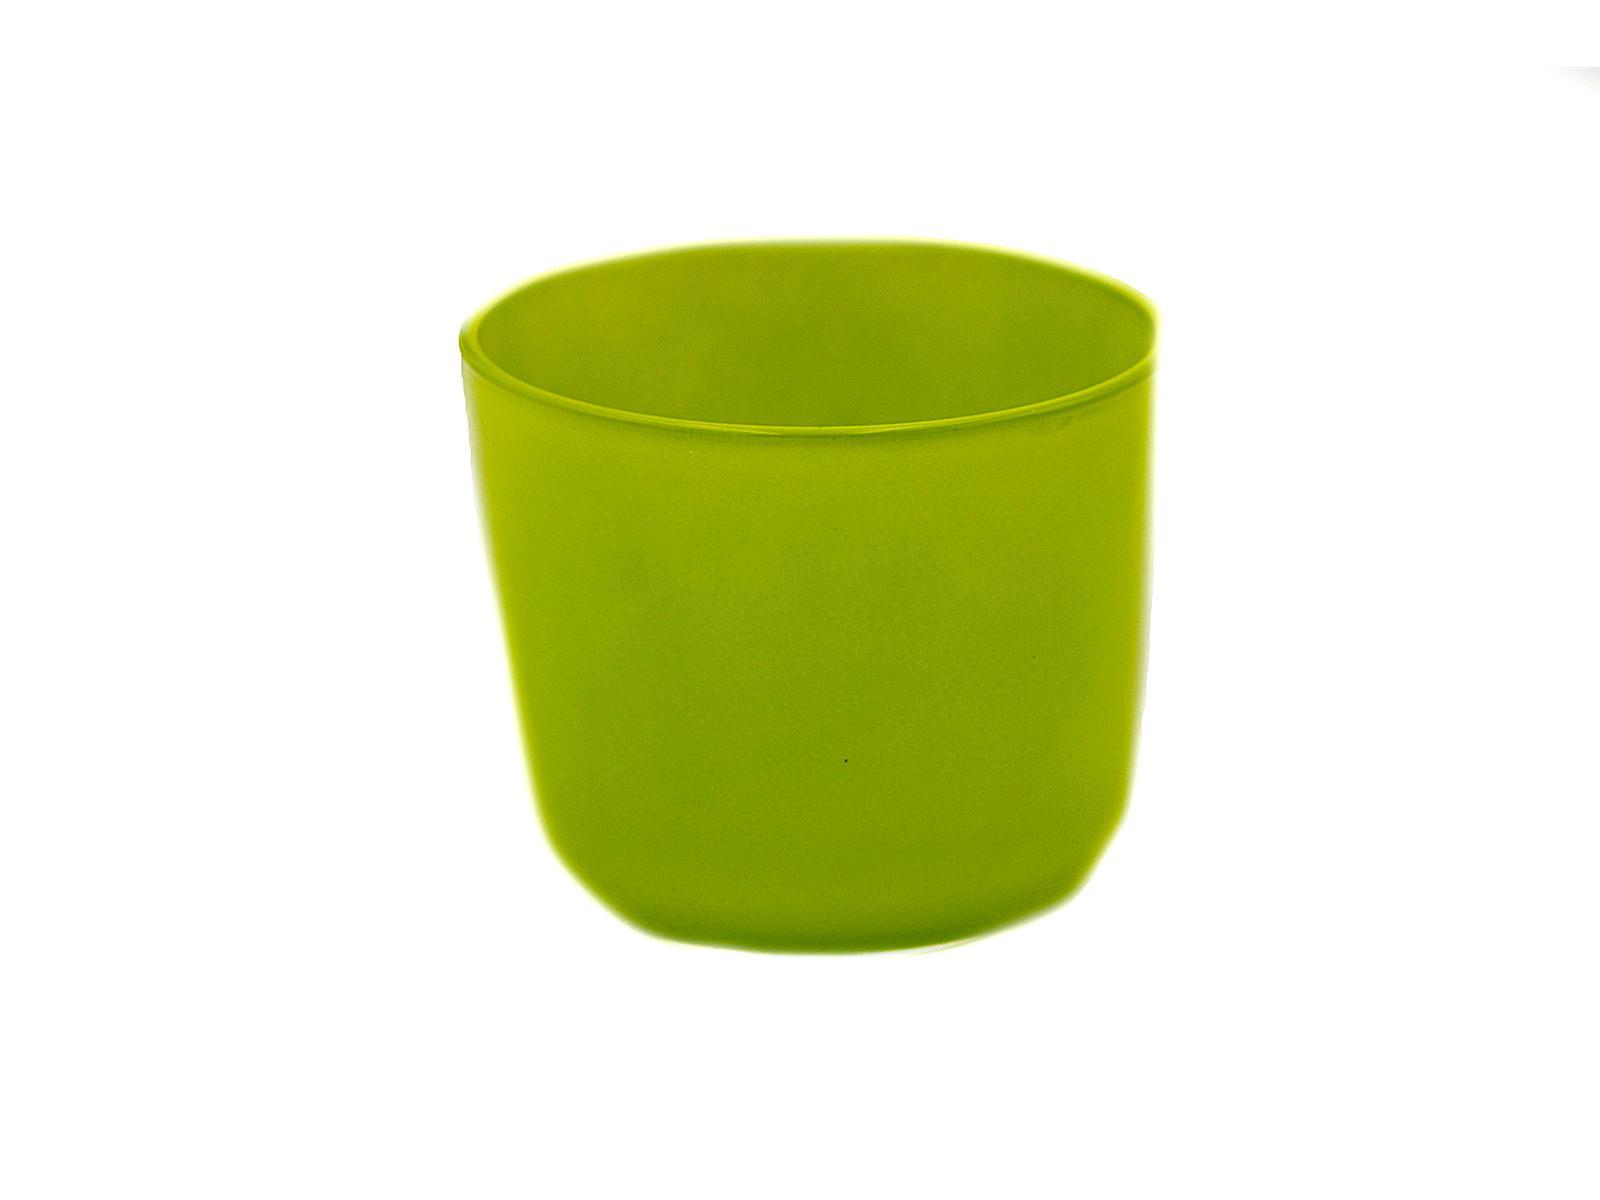 Blumentopf Davinci, Glas grün, 11cm hoch 12,5 cm breit